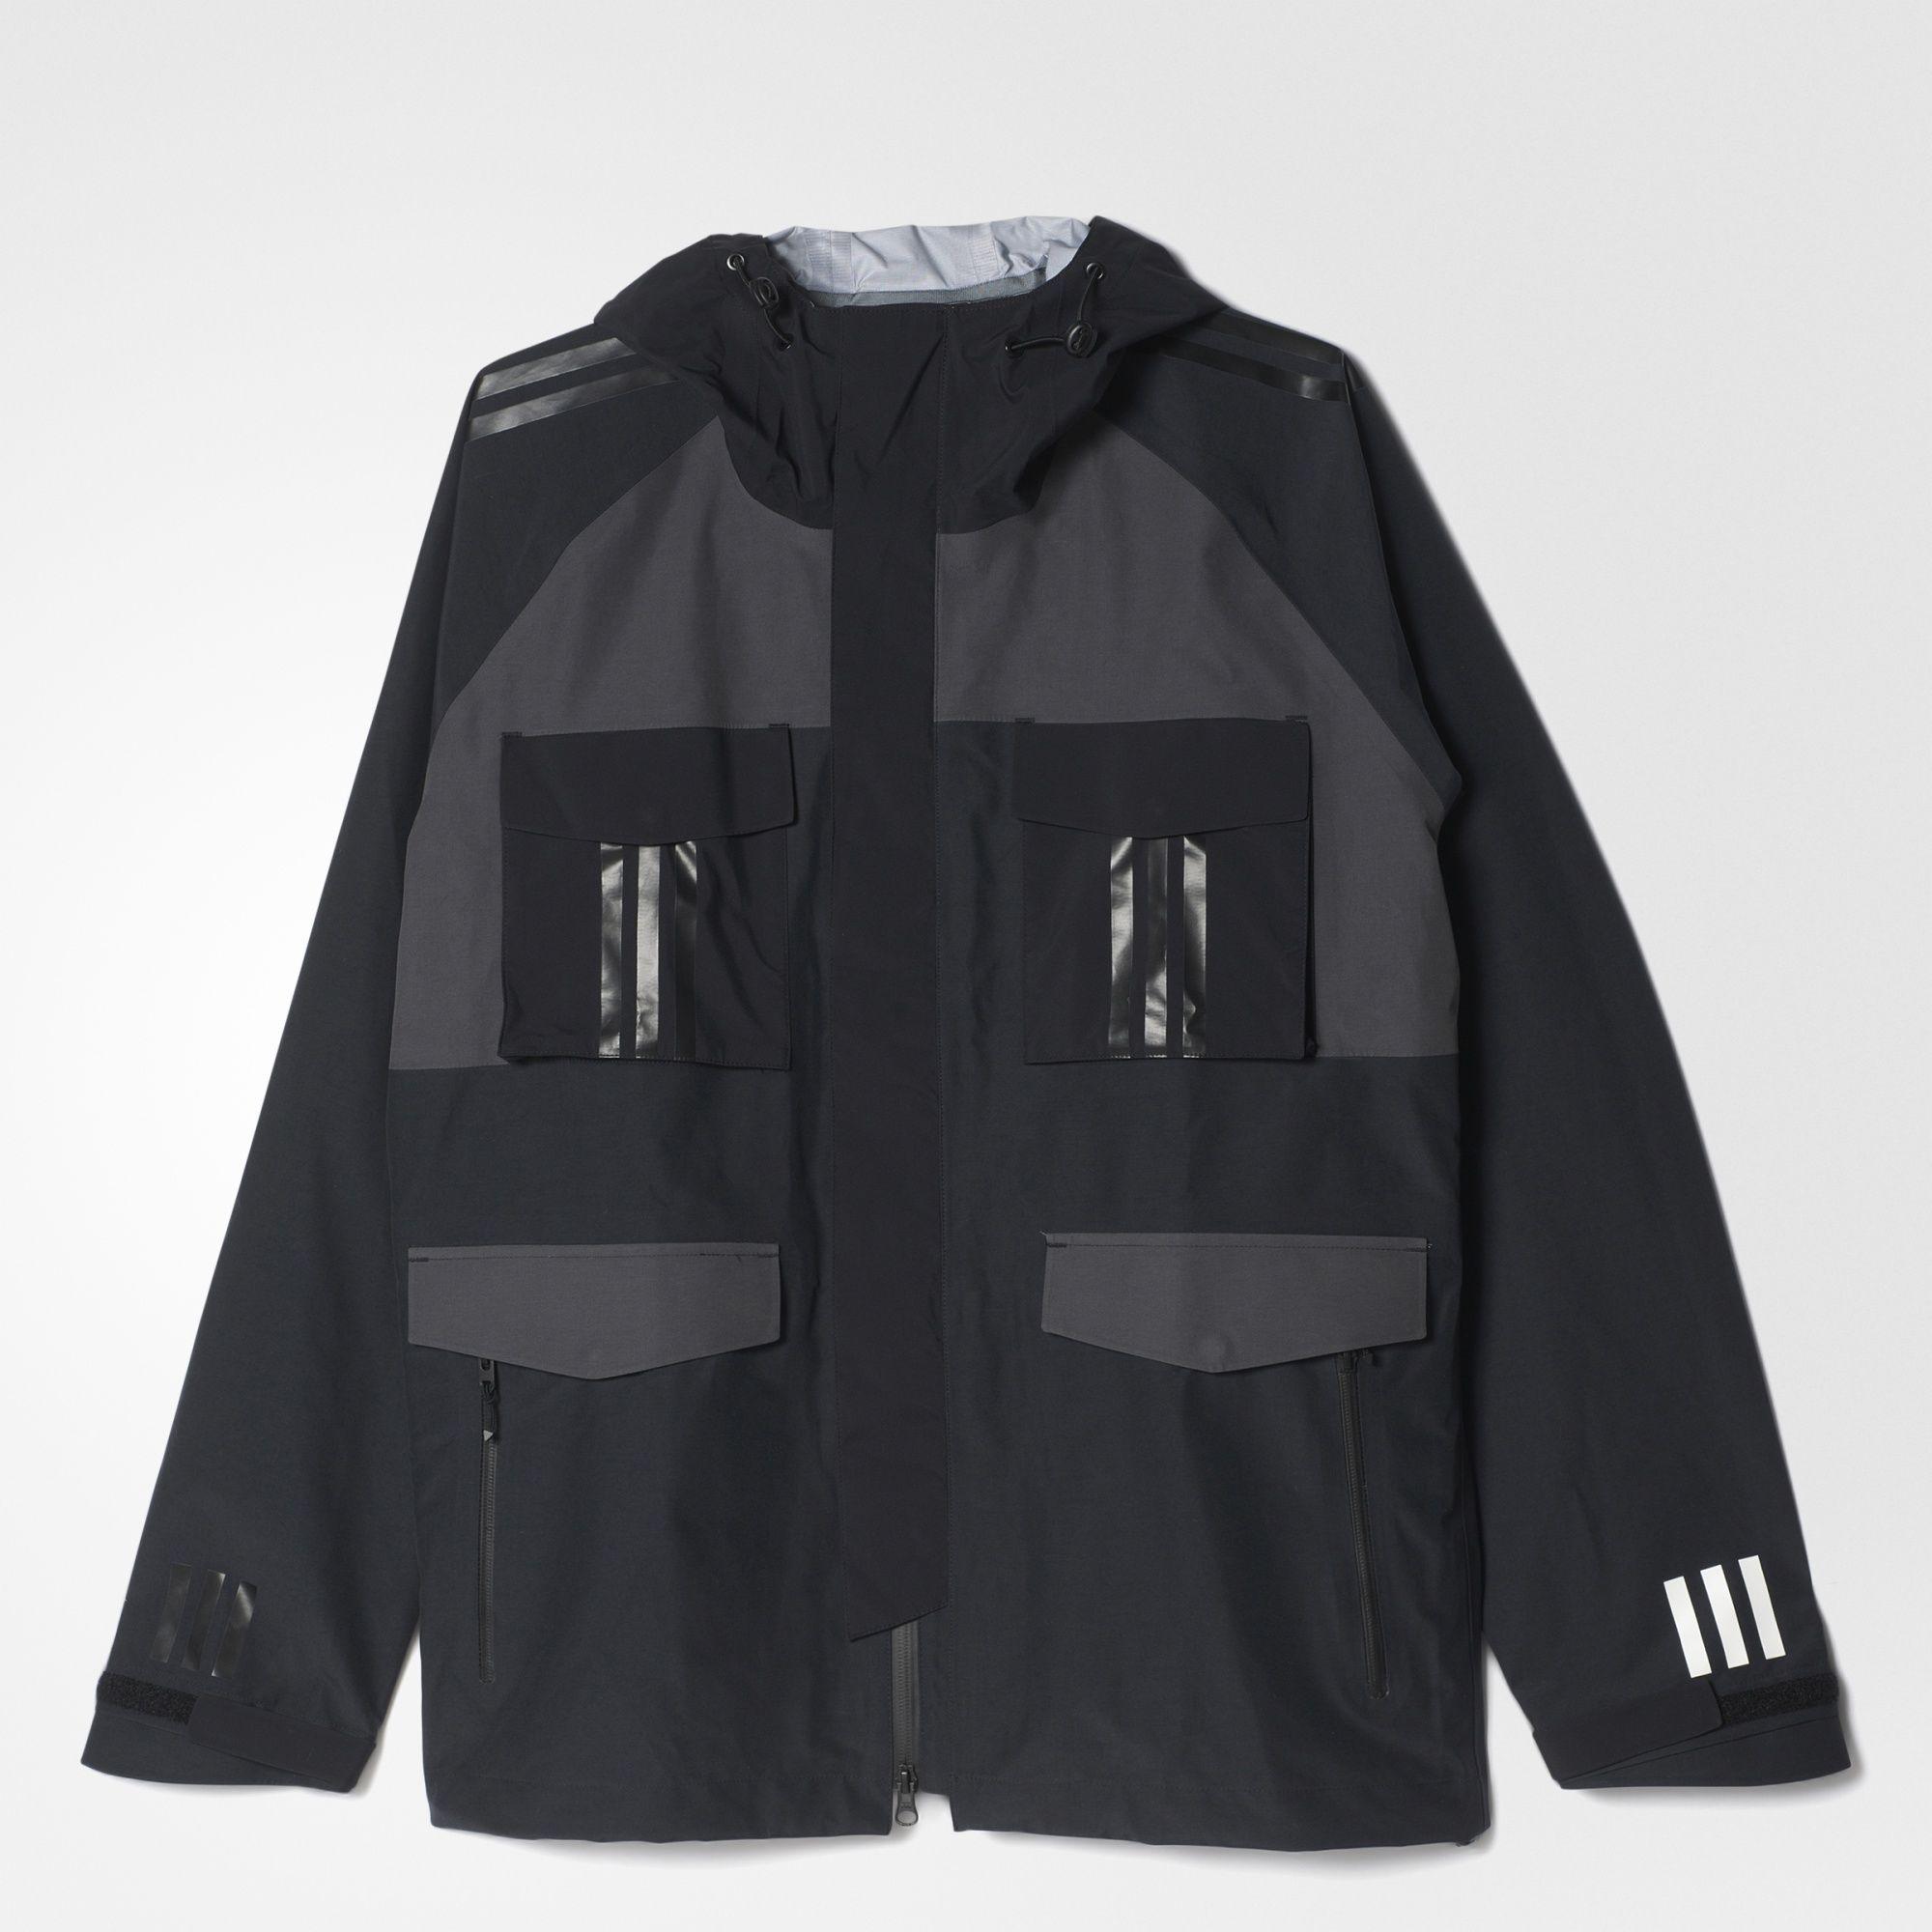 adidas - White Mountaineering Shell Jacket